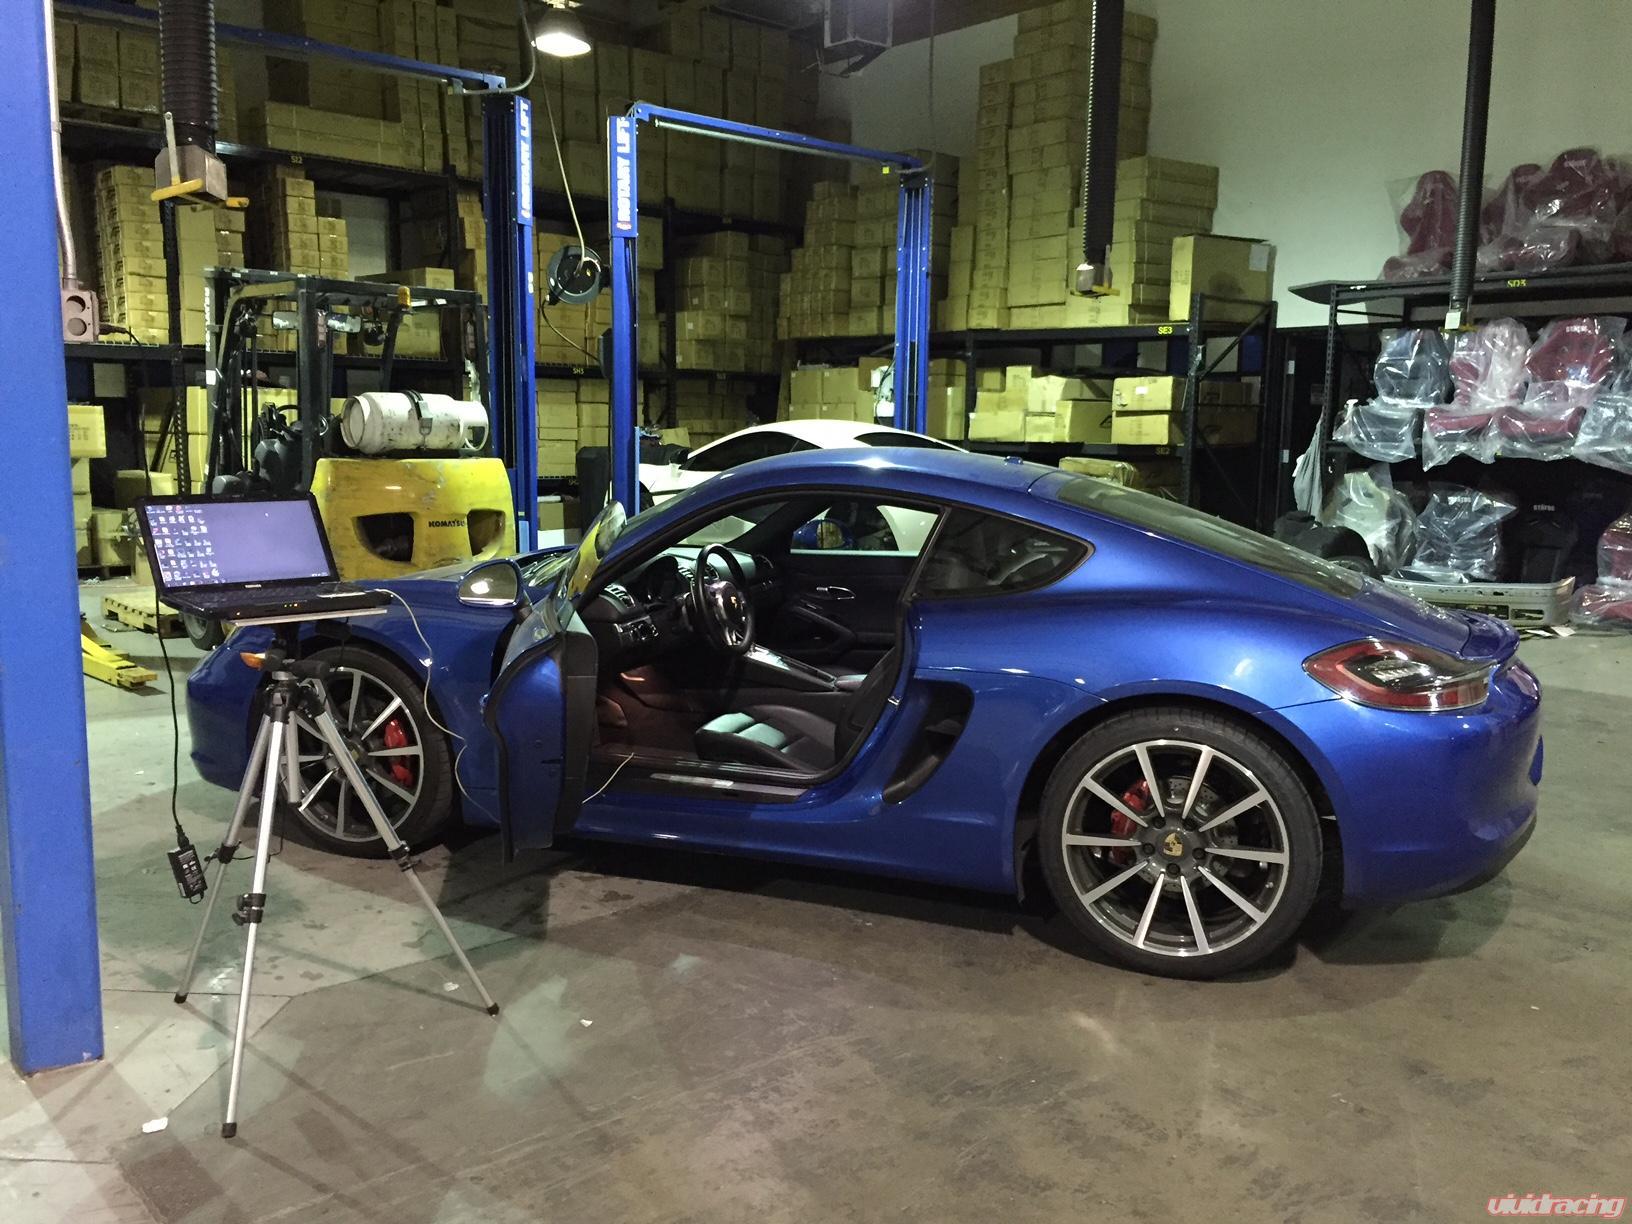 VR Tuned ECU Flash Tune Porsche 981 Cayman S 3 4L 325hp 14-16